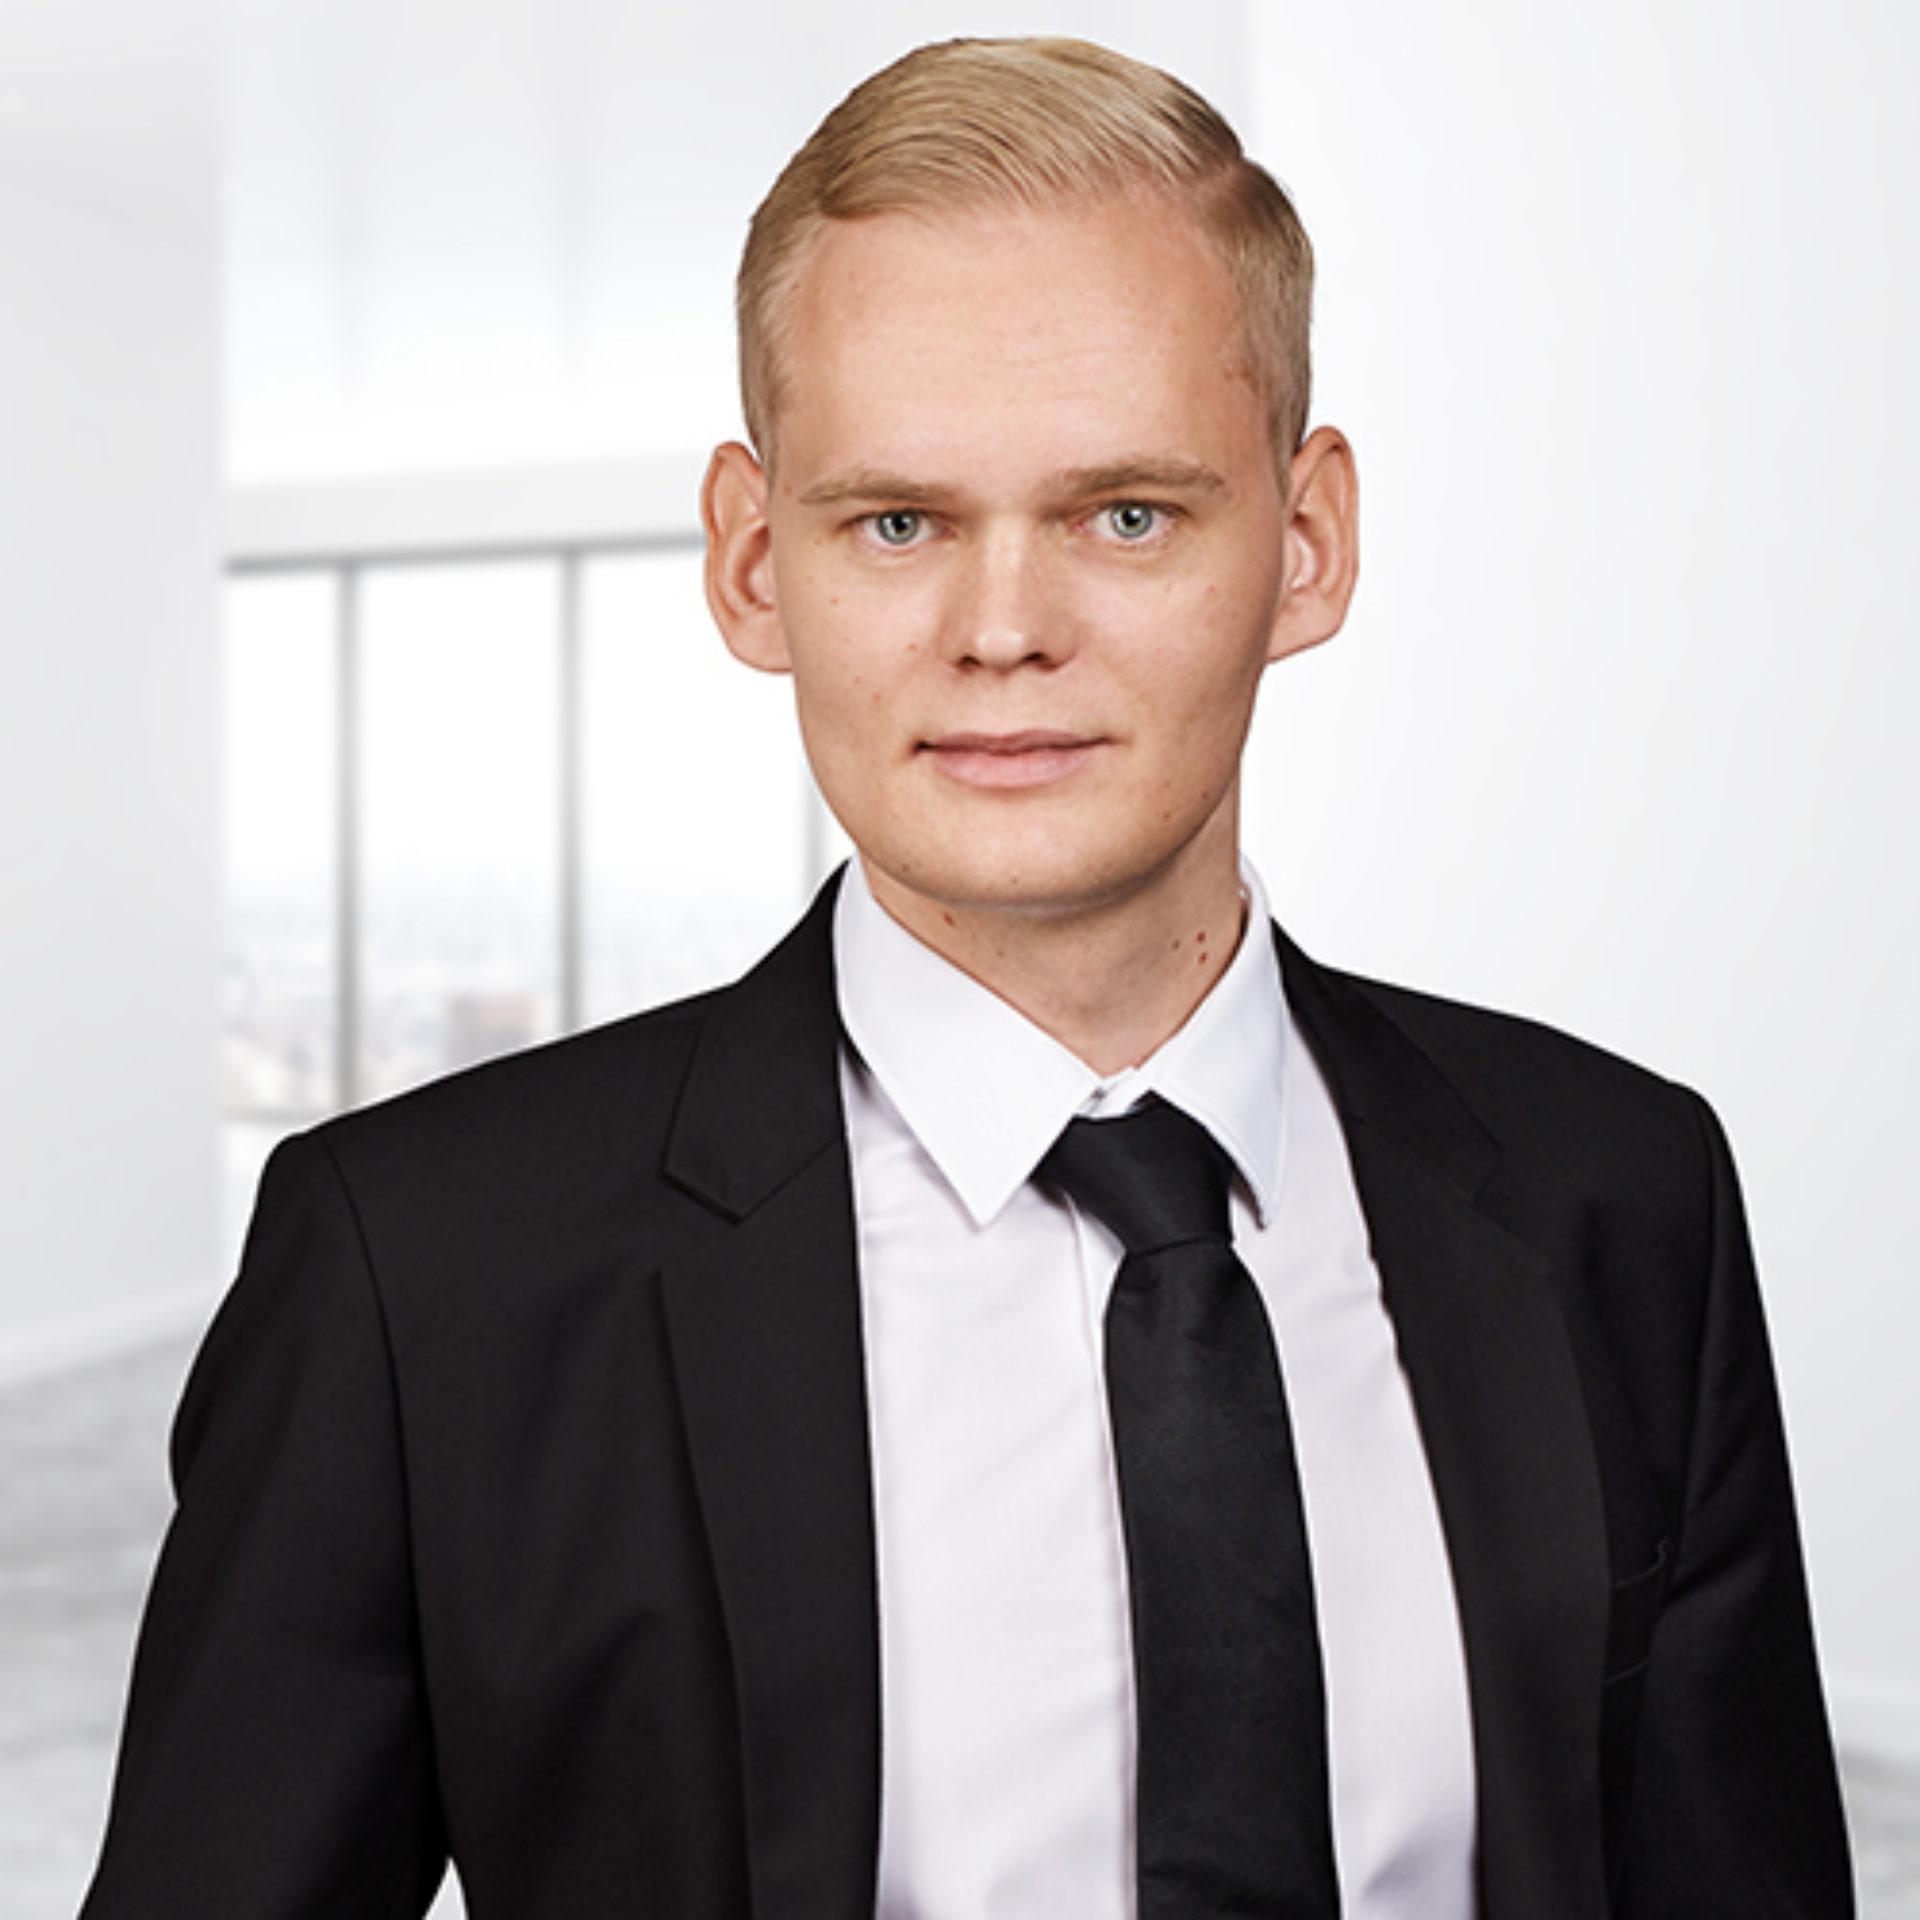 Photo of Jesper Pedersen